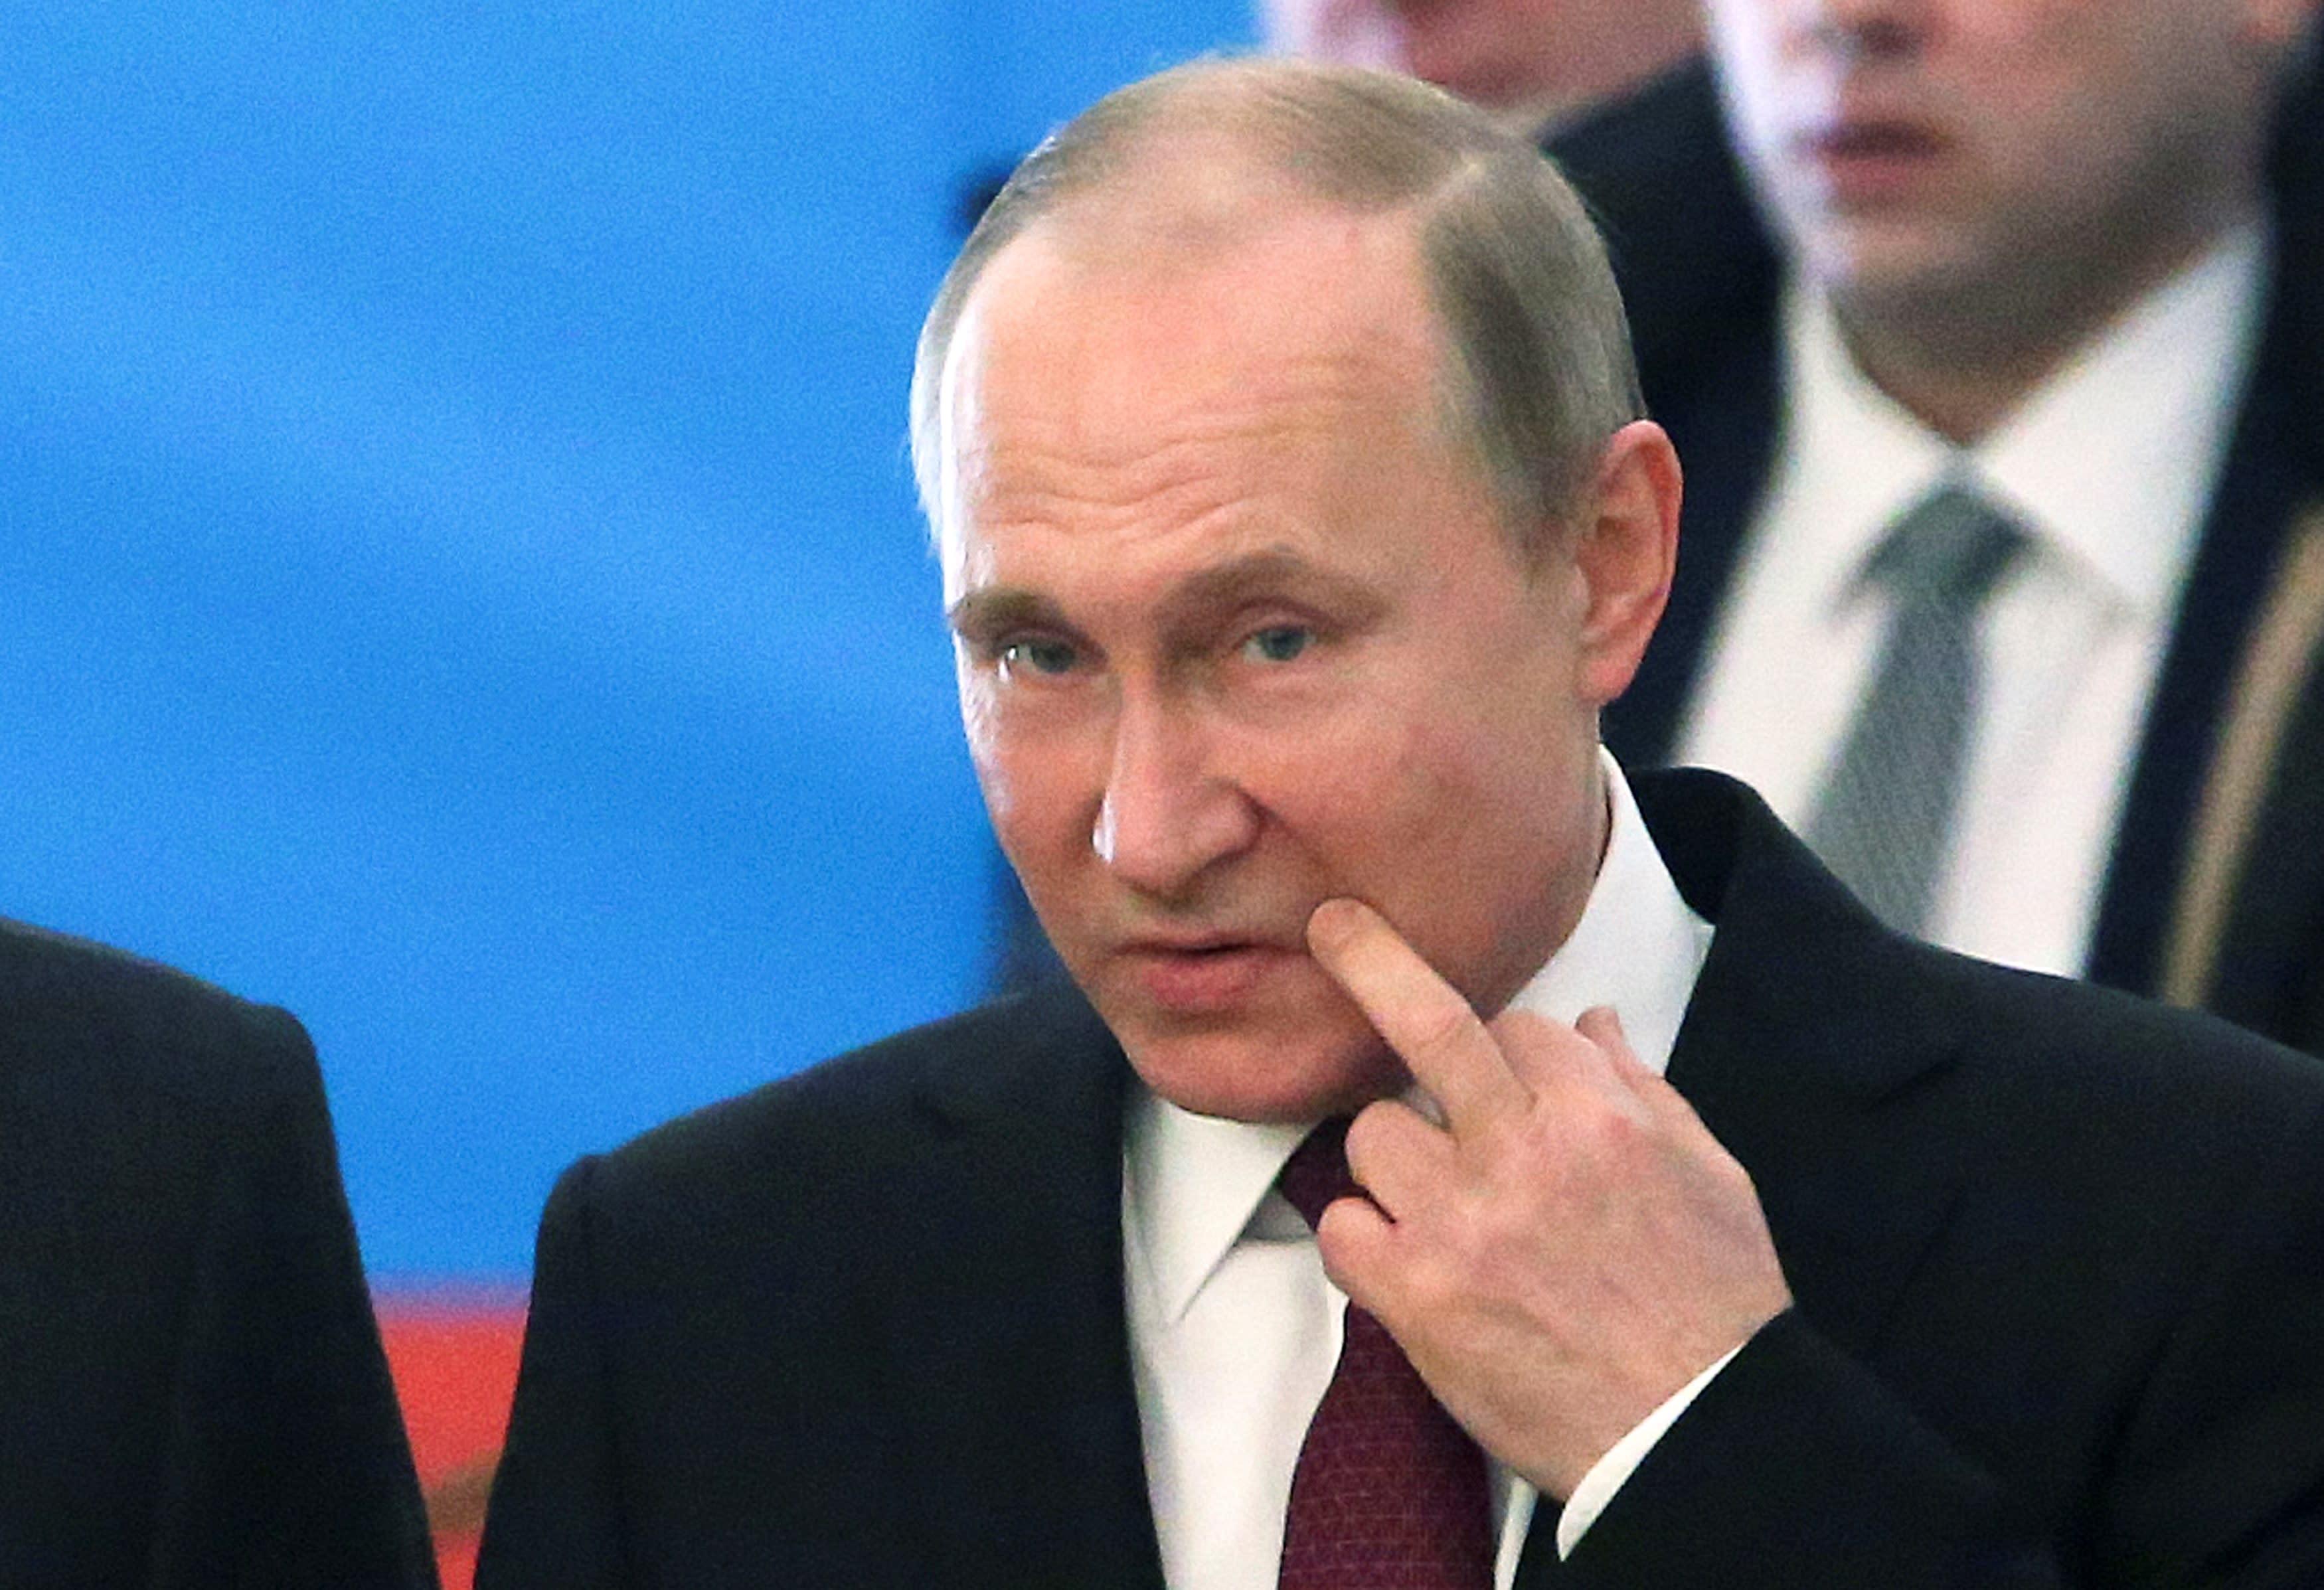 As Putin Threatens U.S. With 'Satan 2' Nuke, Trump Says He Doesn't Want An Arms Race